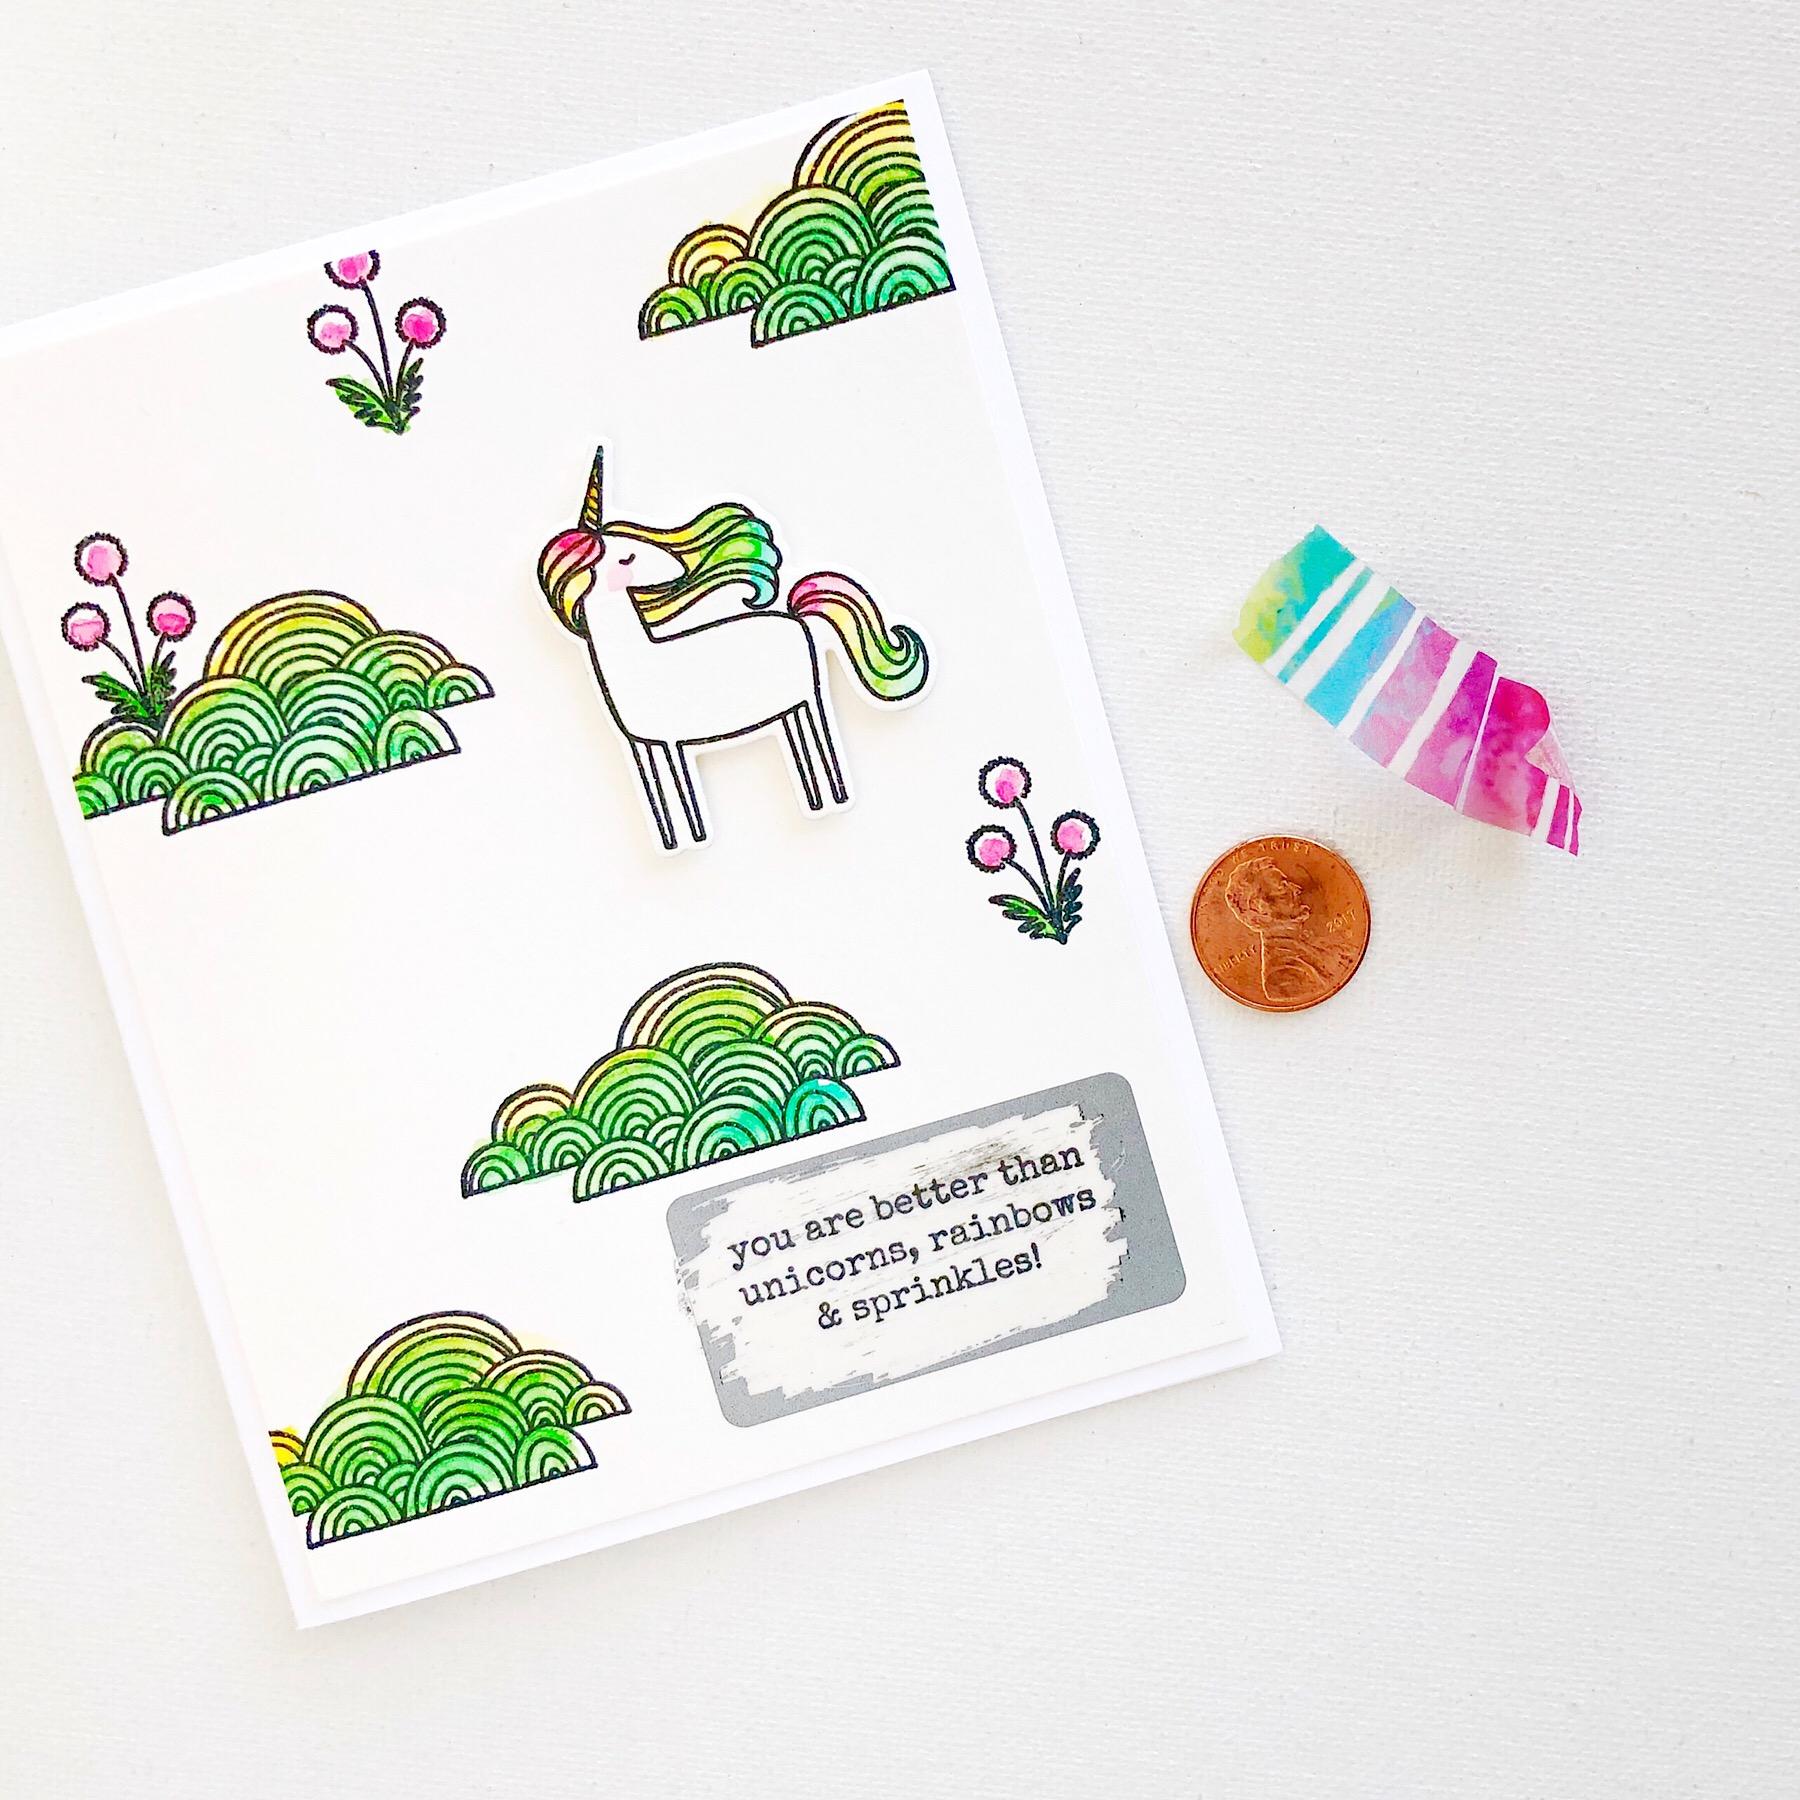 Scratch-off-unicorn-004-je.jpg